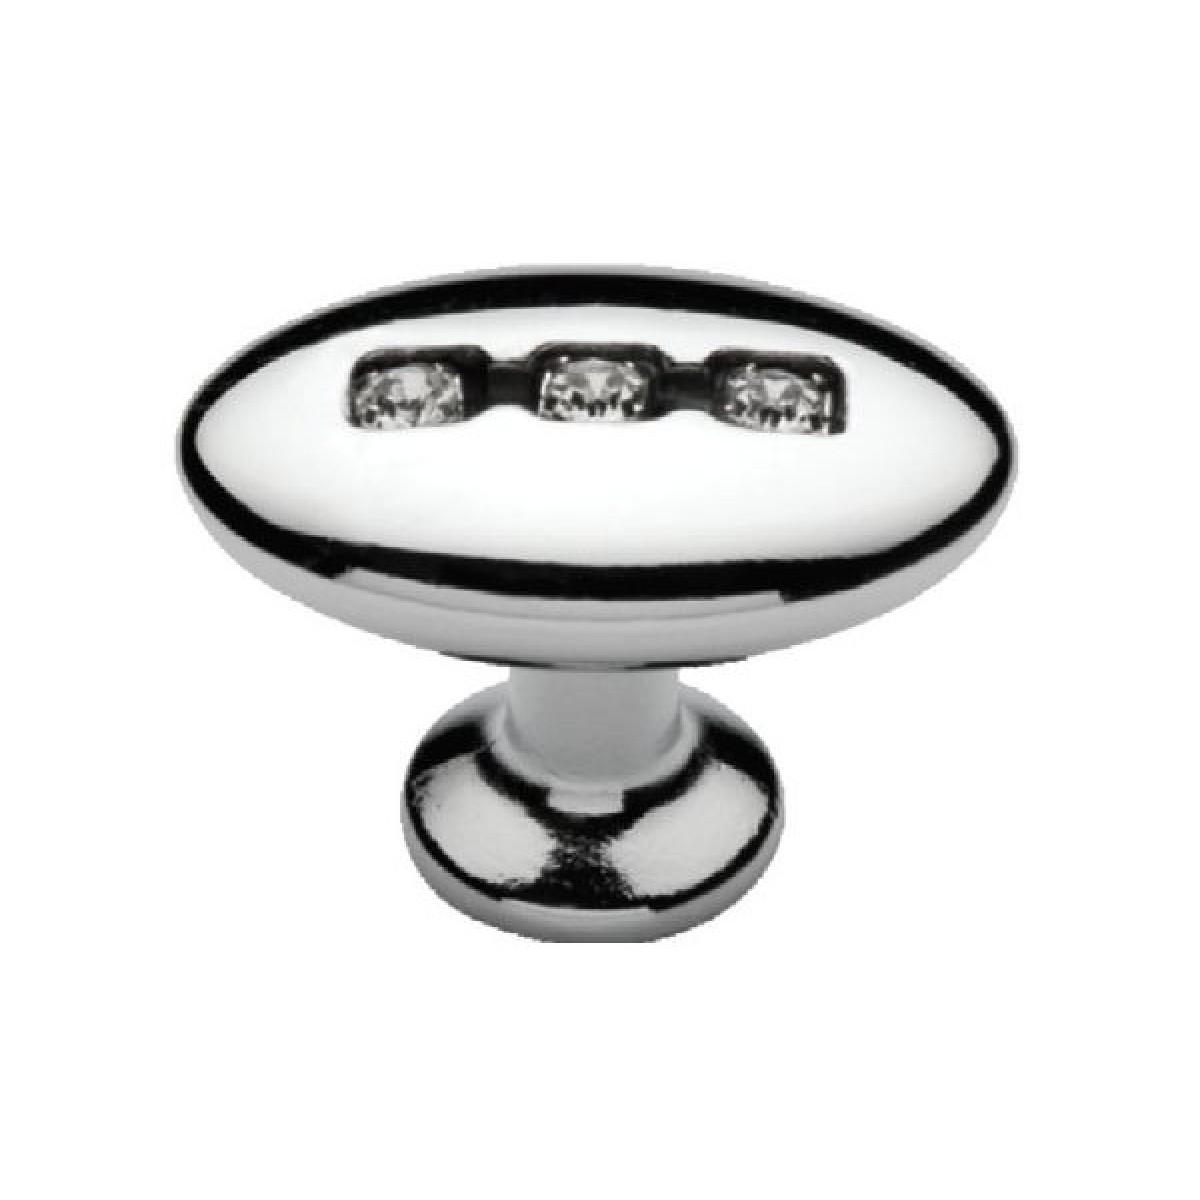 Ручка мебельная Ozkardesler SOMUN DUGME 6059-06 Хром с камнями